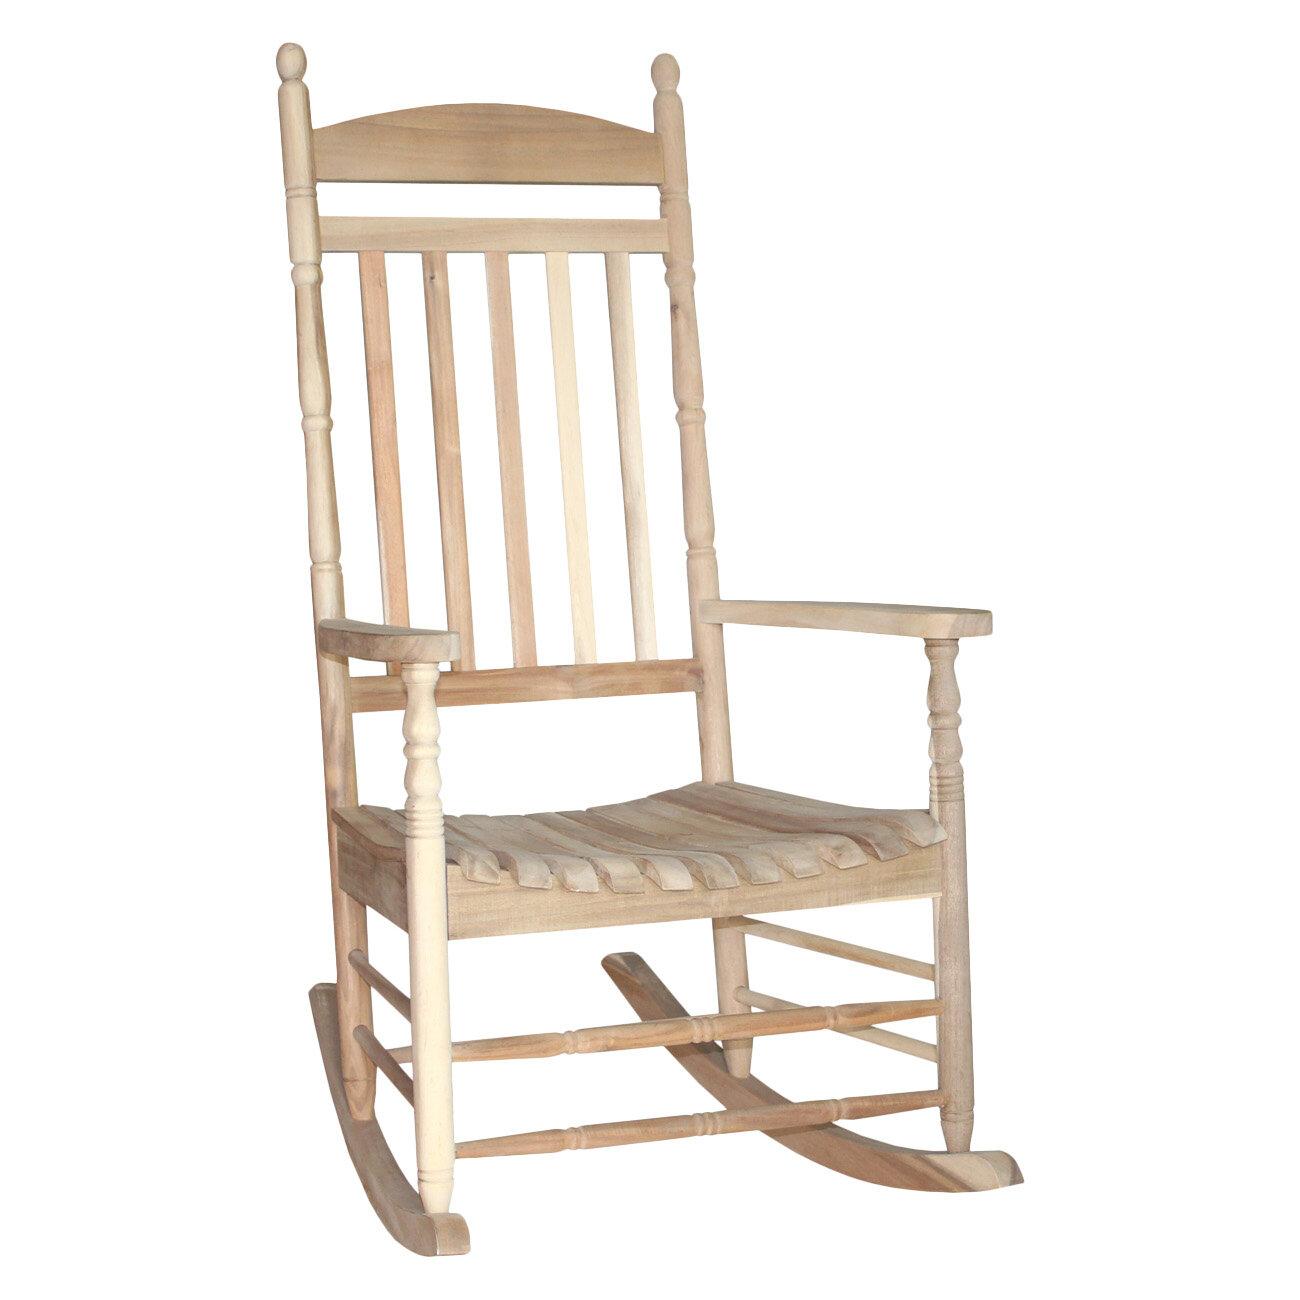 August Grove Rayane Solid Wood Rocking Chair U0026 Reviews | Wayfair